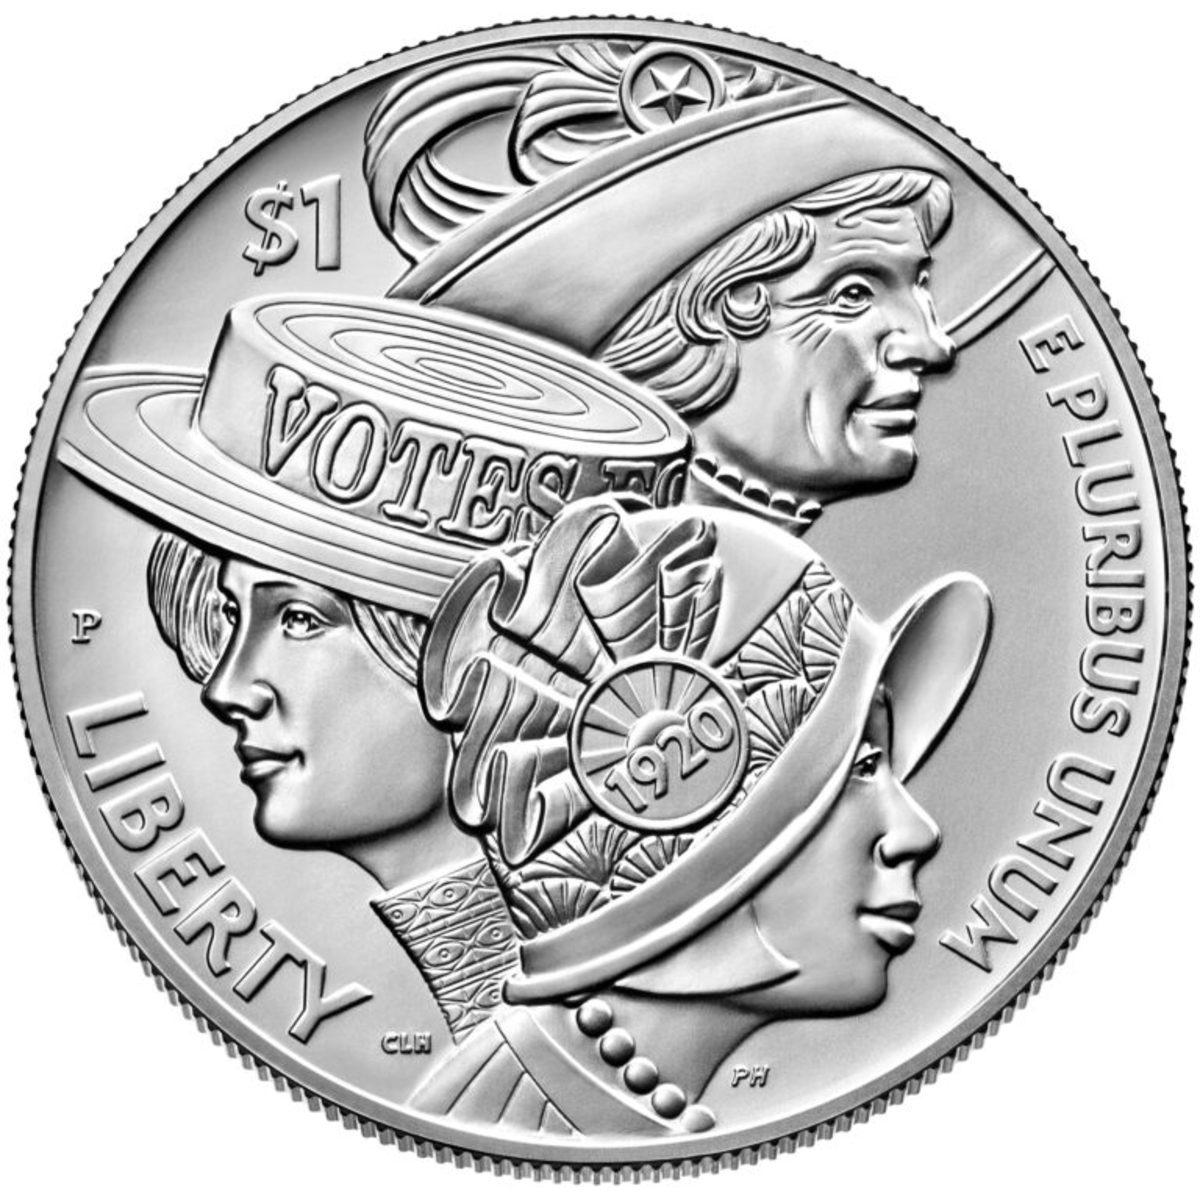 Women's Suffrage Centennial silver dollar. (Image courtesy U.S. Mint.)